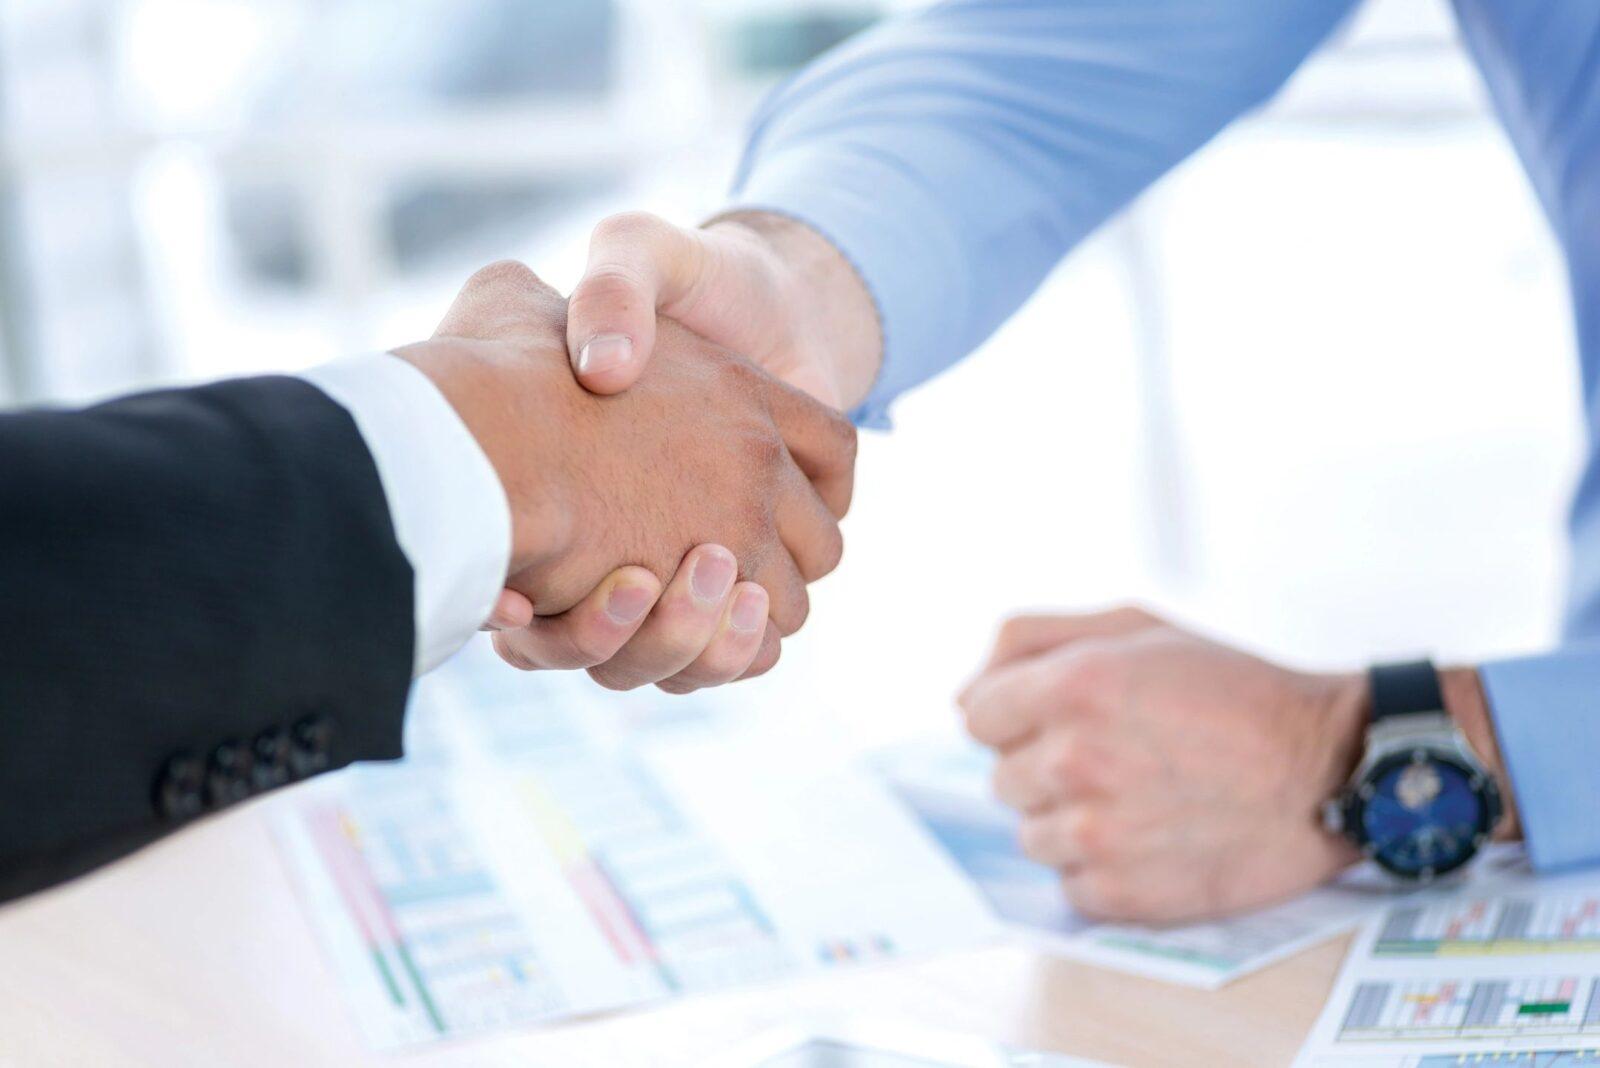 loan officer getting realtor business hand shake